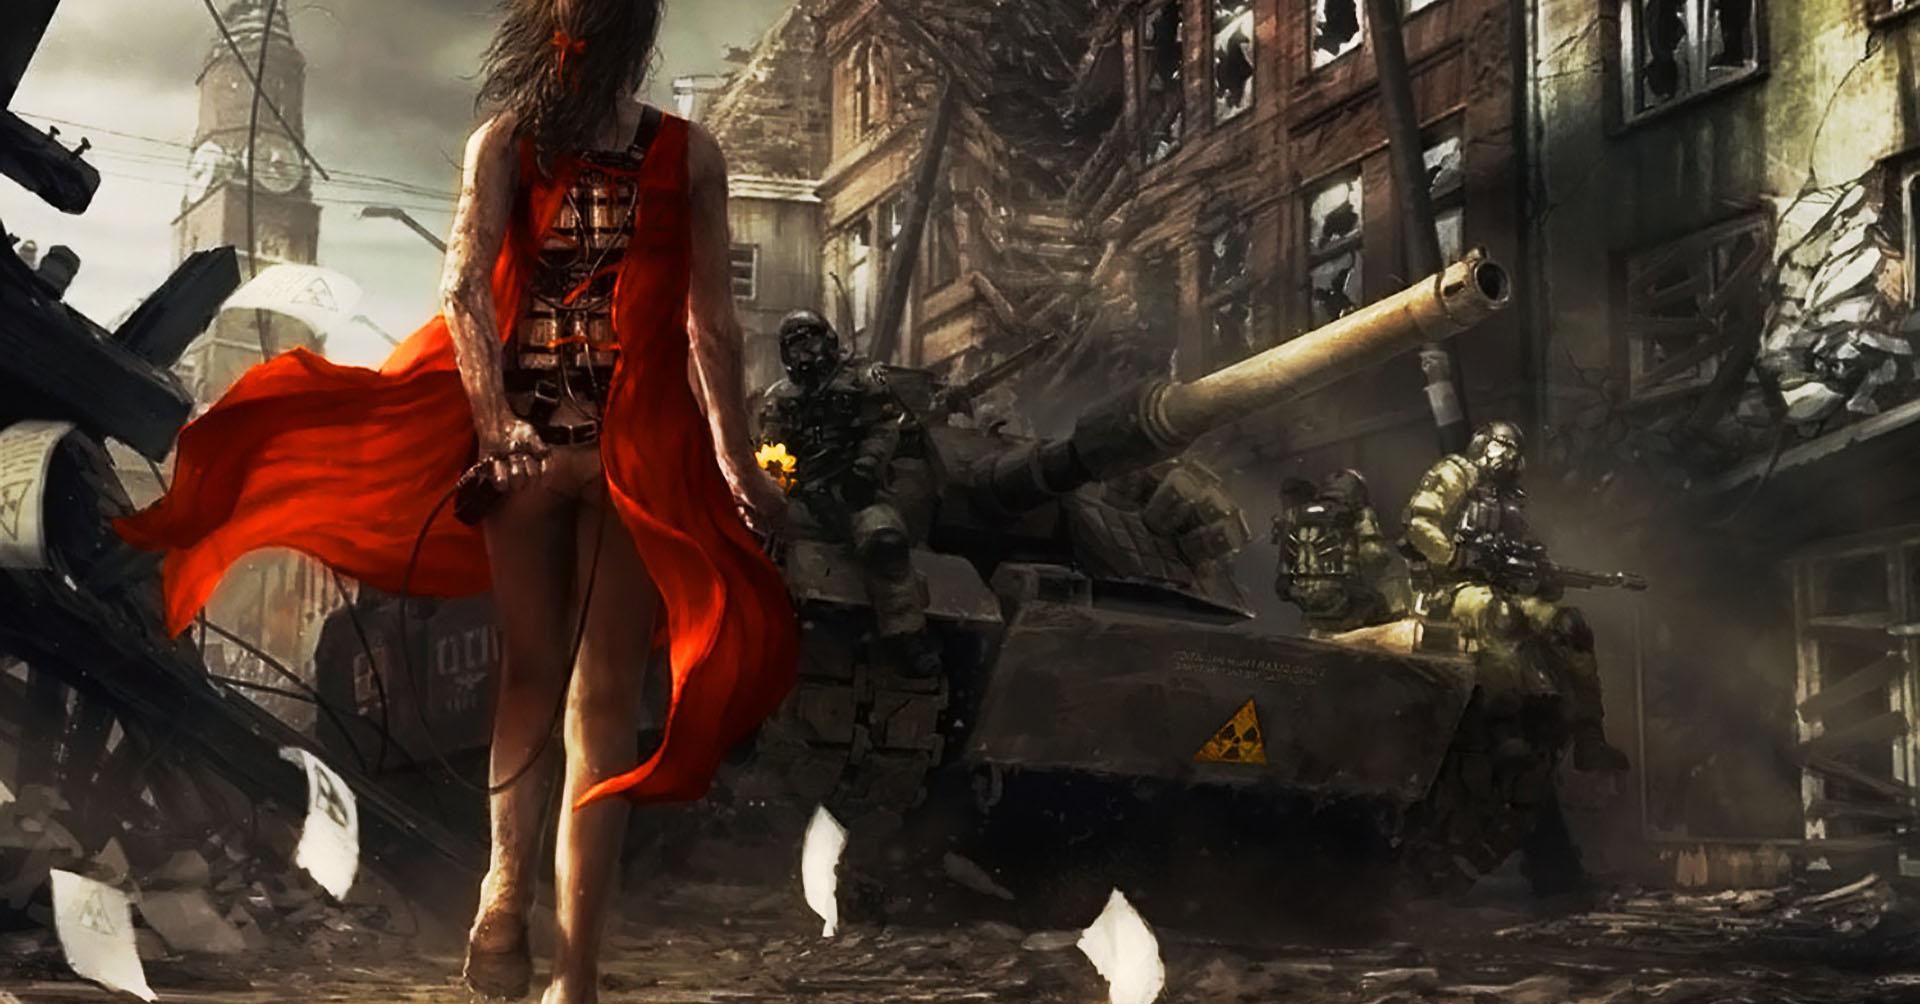 Sad Girl Wallpaper 1080p Military Suicide Apocalypse War Dress Wallpapers Hd